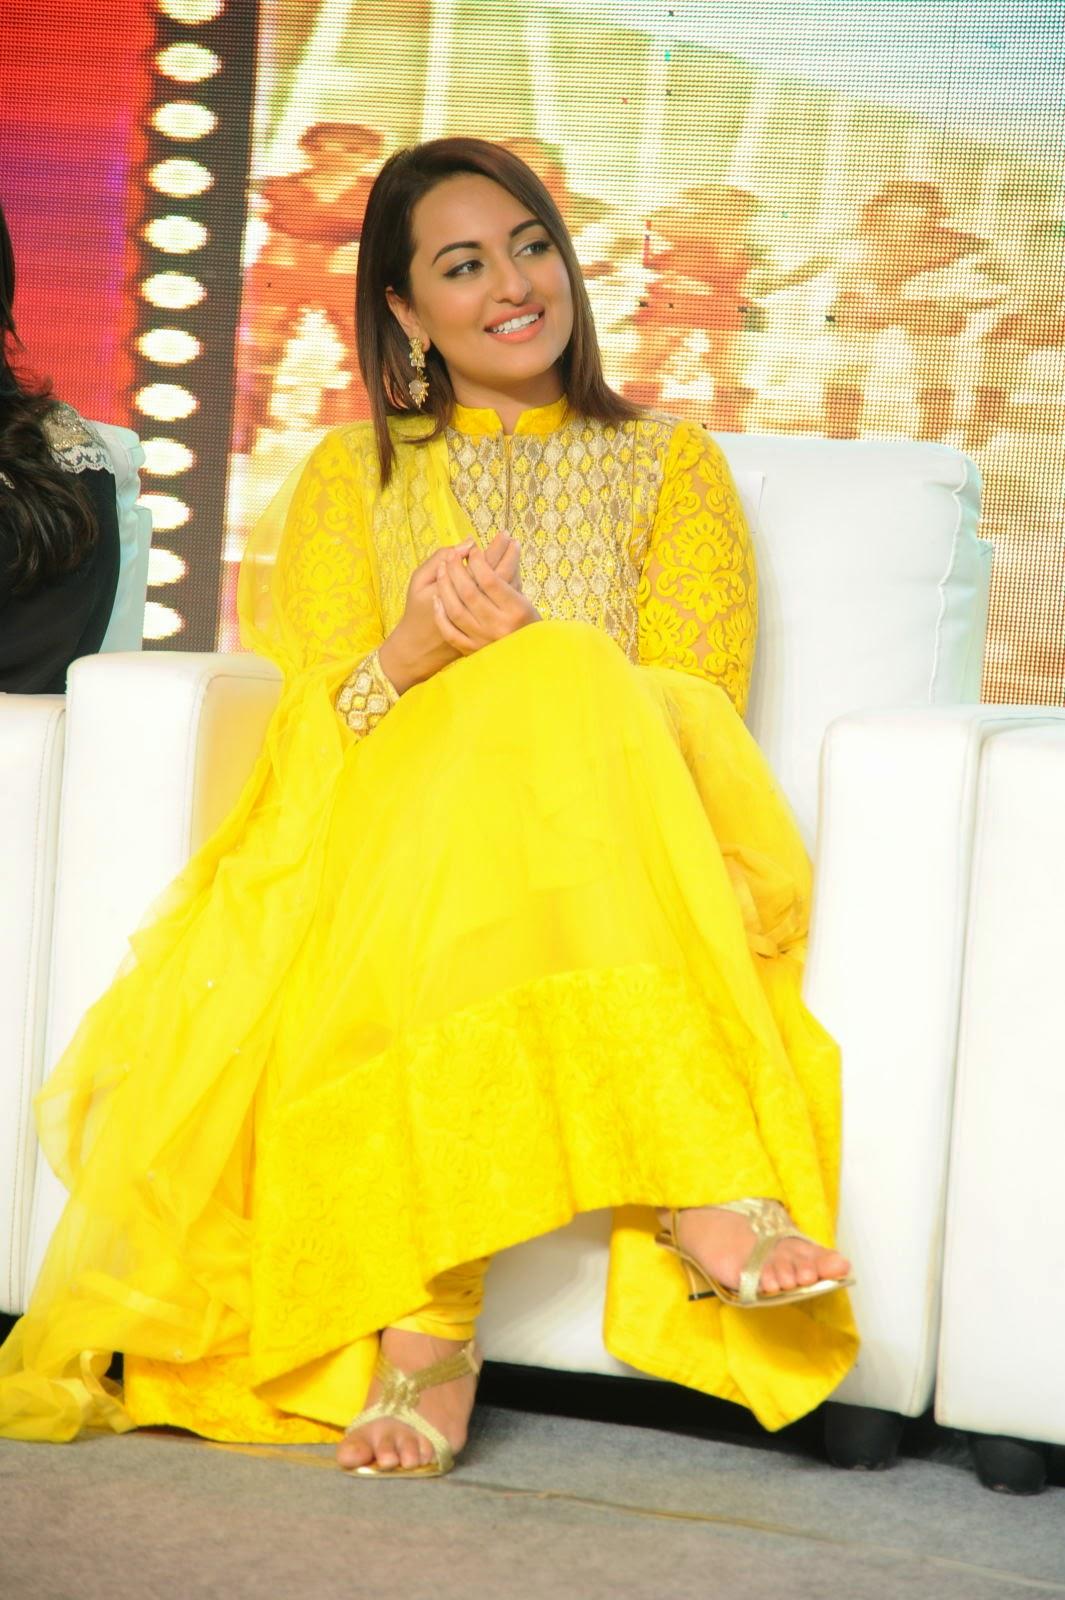 Sonakshi Sinha in yellow Salwar Kameez at Lingaa Event.